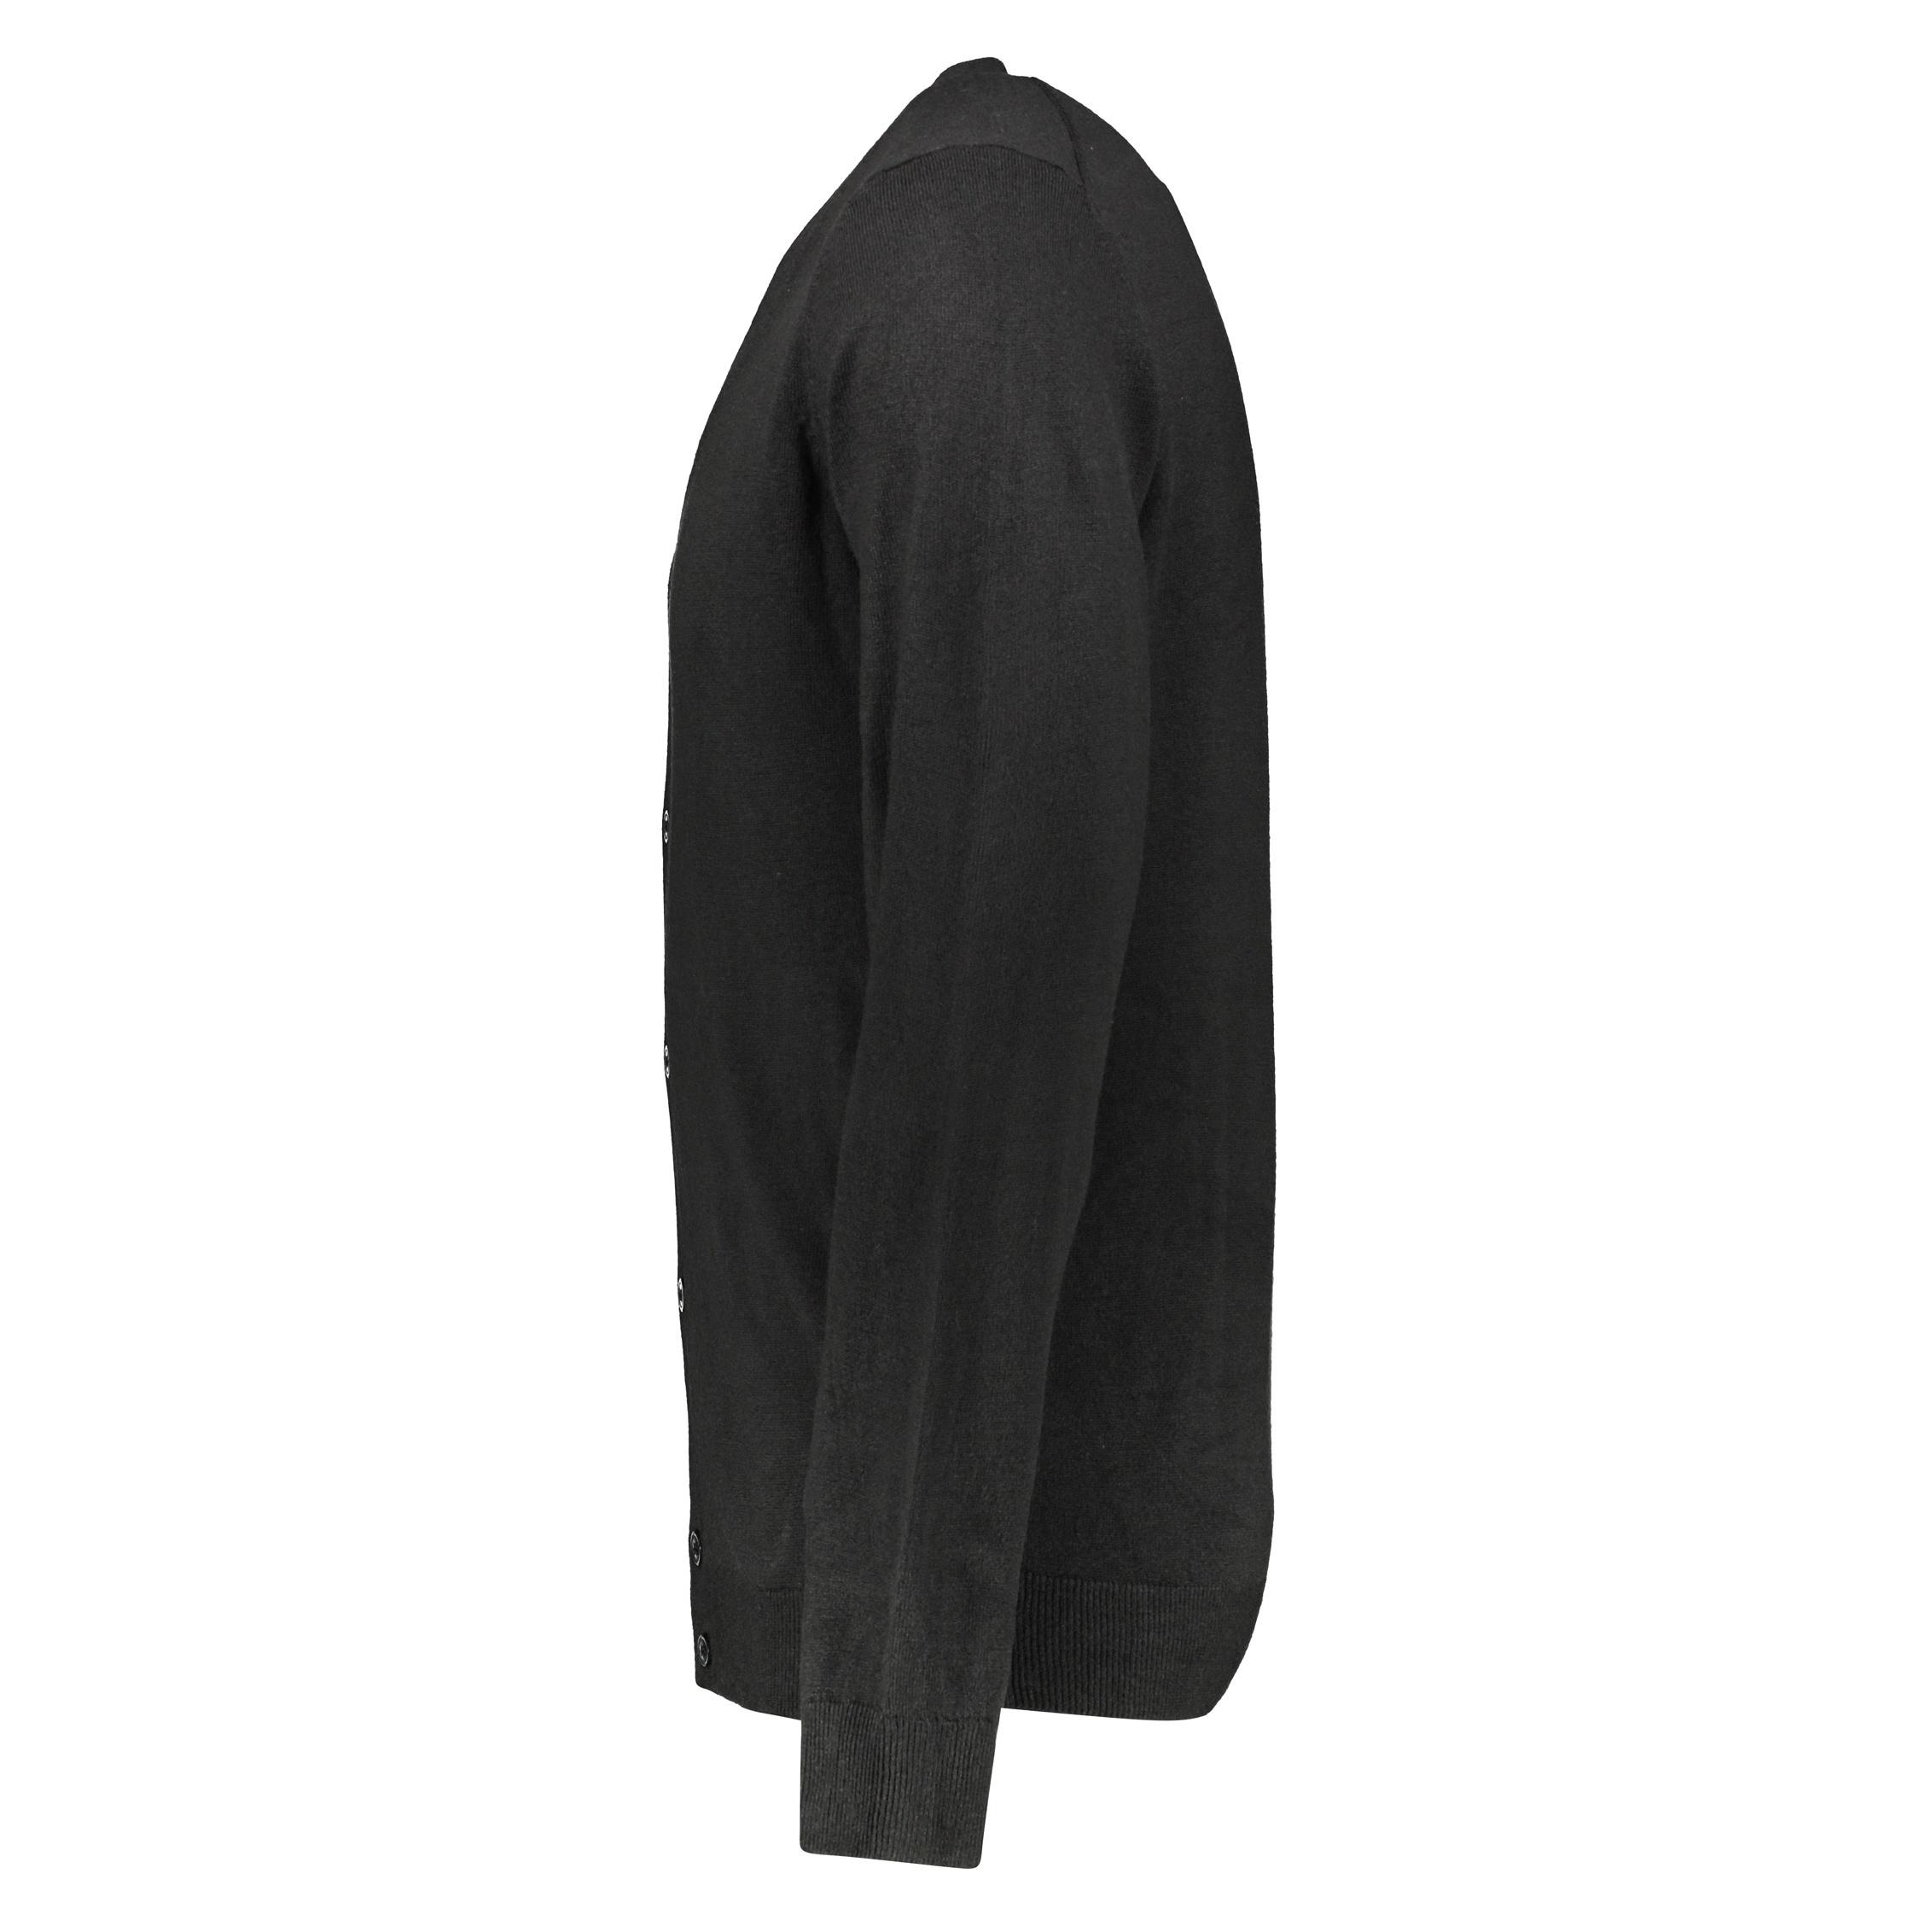 ژاکت مردانه او وی اس مدل 006216669-BLACK